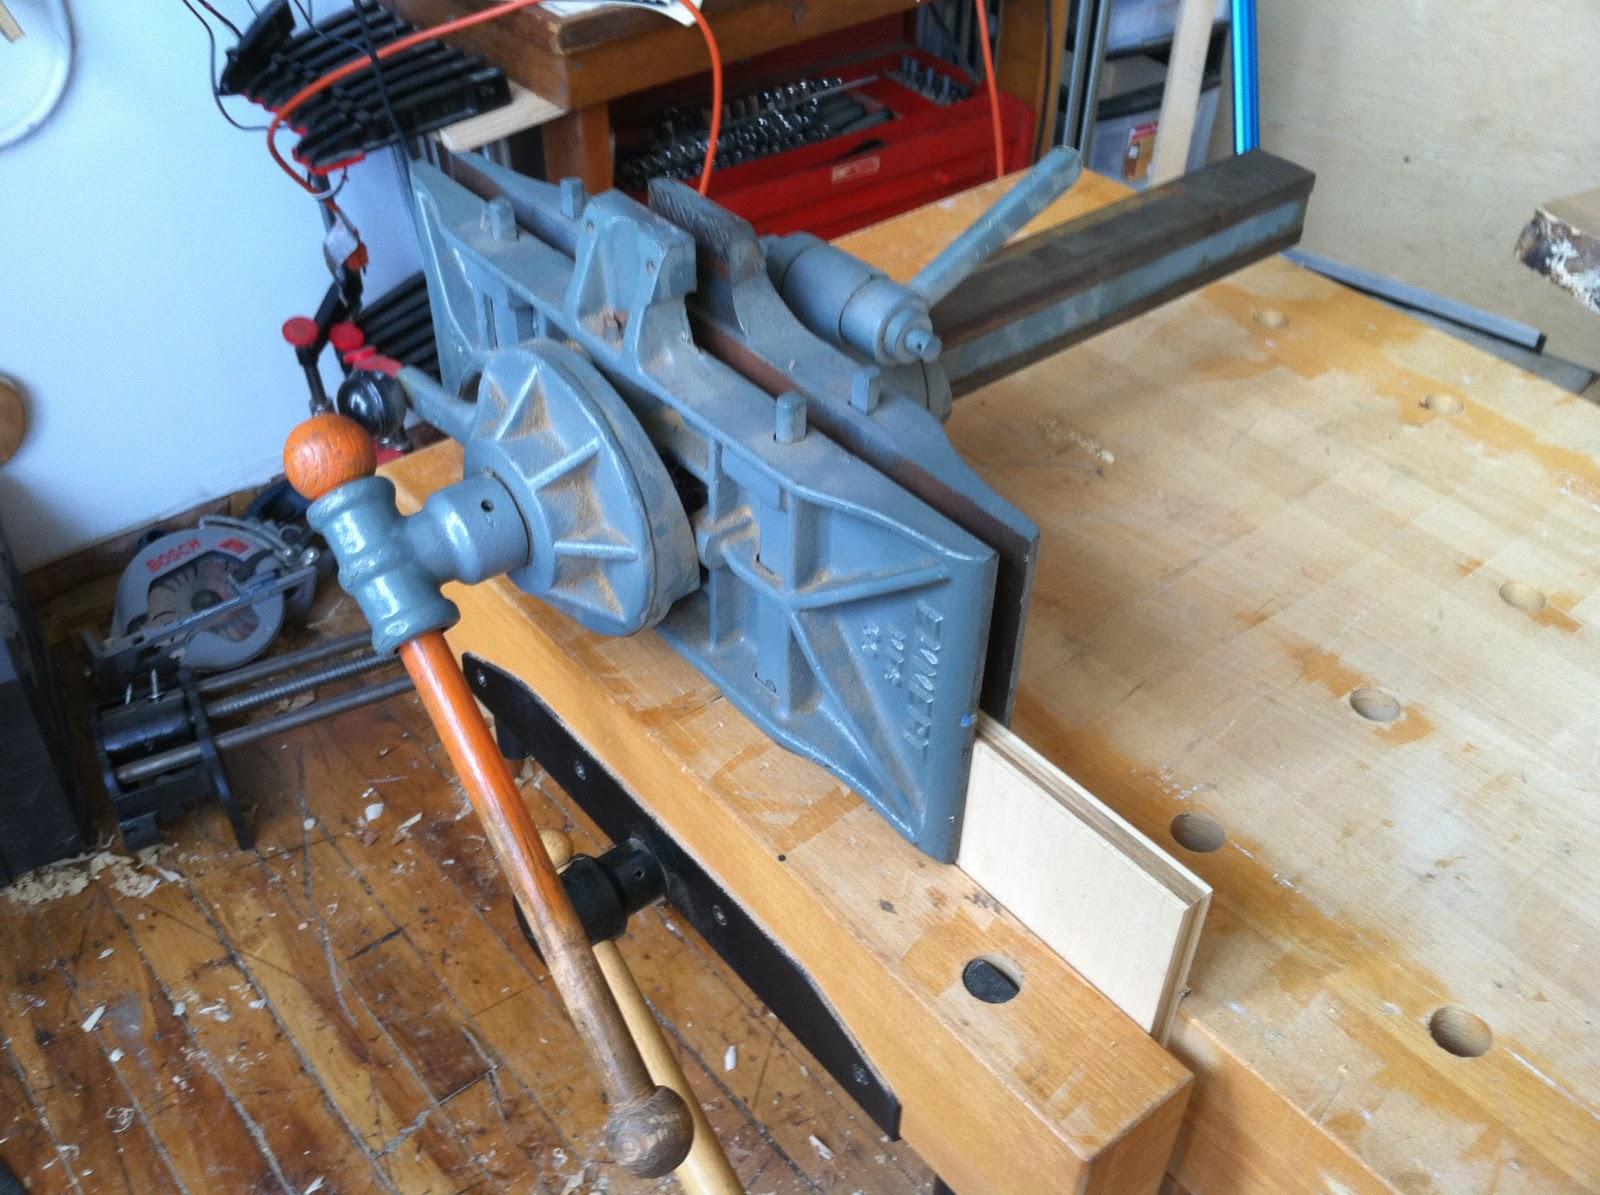 James Watriss Installing The Emmert Pattern Maker S Vise